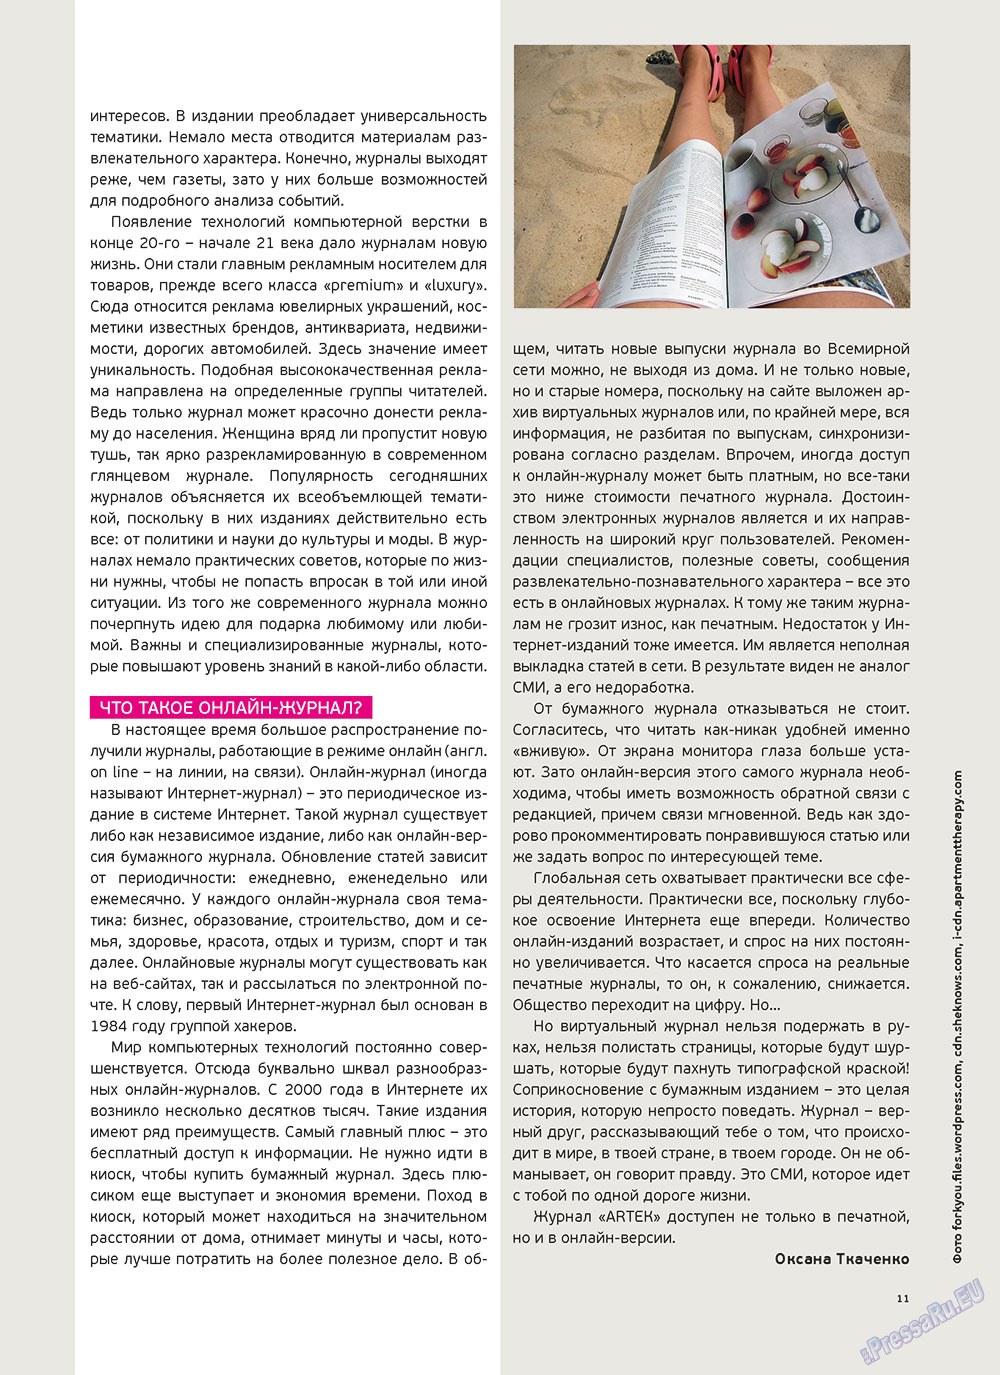 Артек (журнал). 2012 год, номер 5, стр. 13